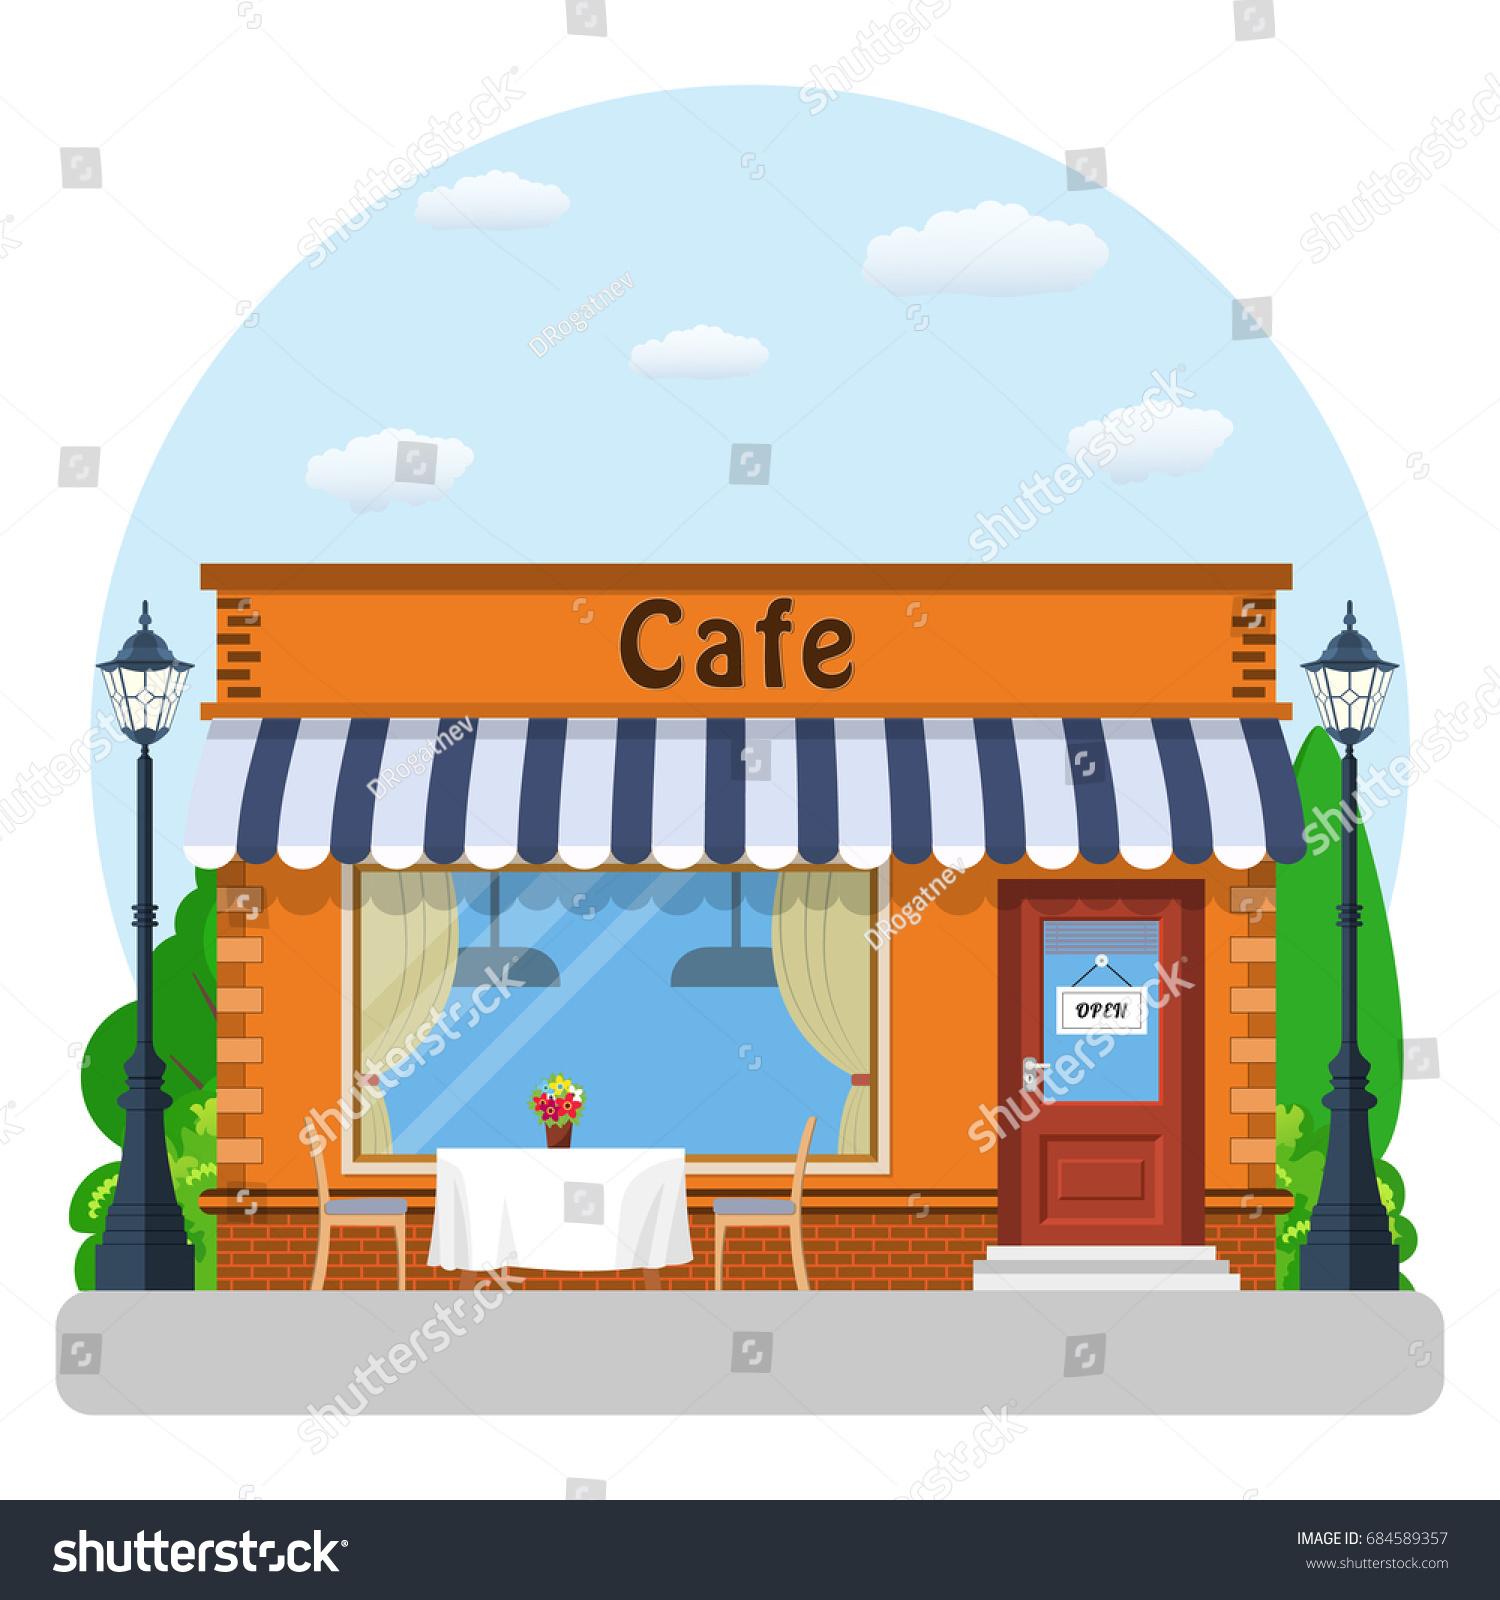 Vector De Stock Libre De Regalias Sobre Cafe Shop Exterior Street Restraunt Building684589357